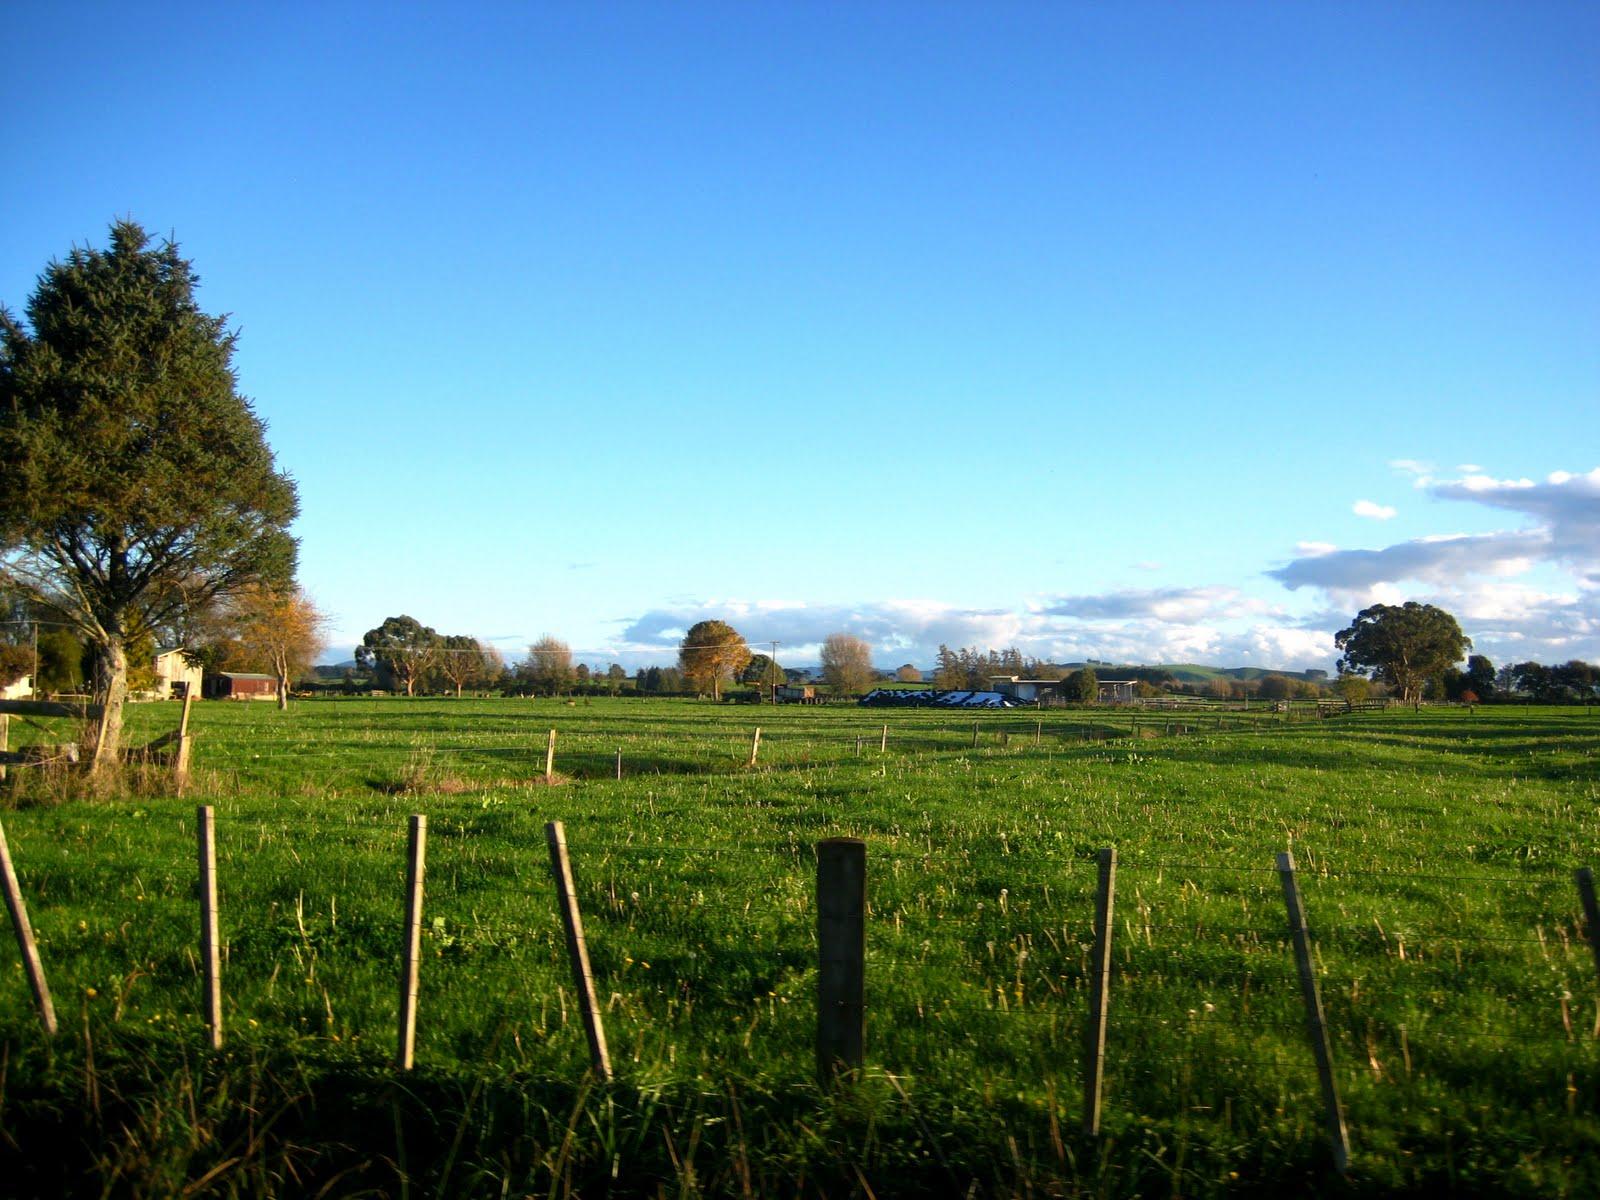 Christchurch Wallpaper: Pin Countryside-christchurch-wallpapers-wallpaper-travel